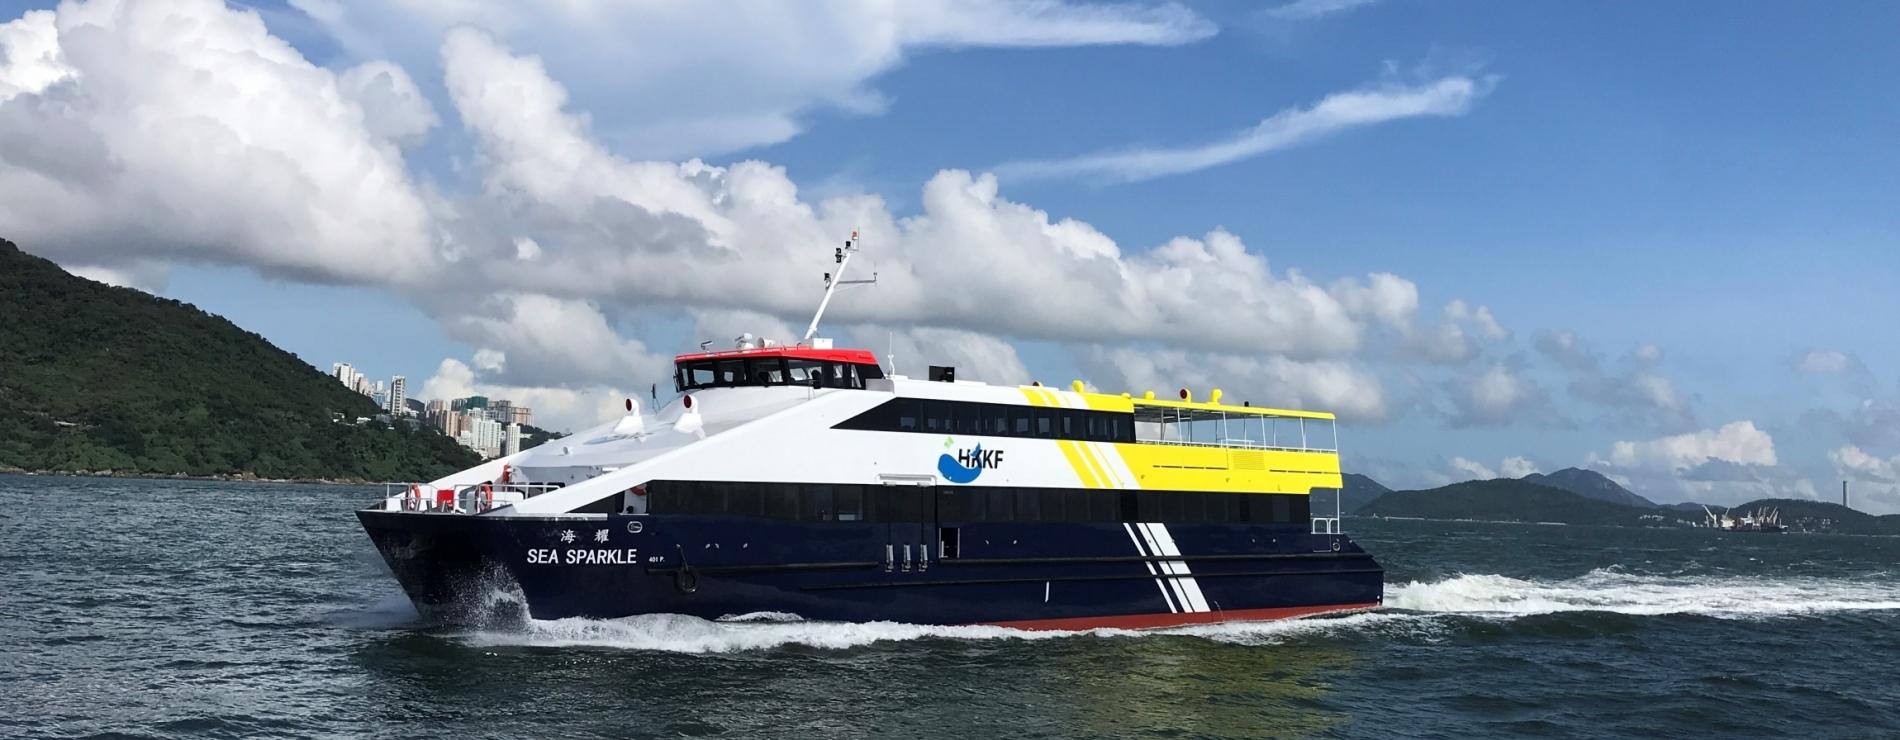 #5126 Sea Sparkle 28-32m GRP Catamaran Ferry (1)